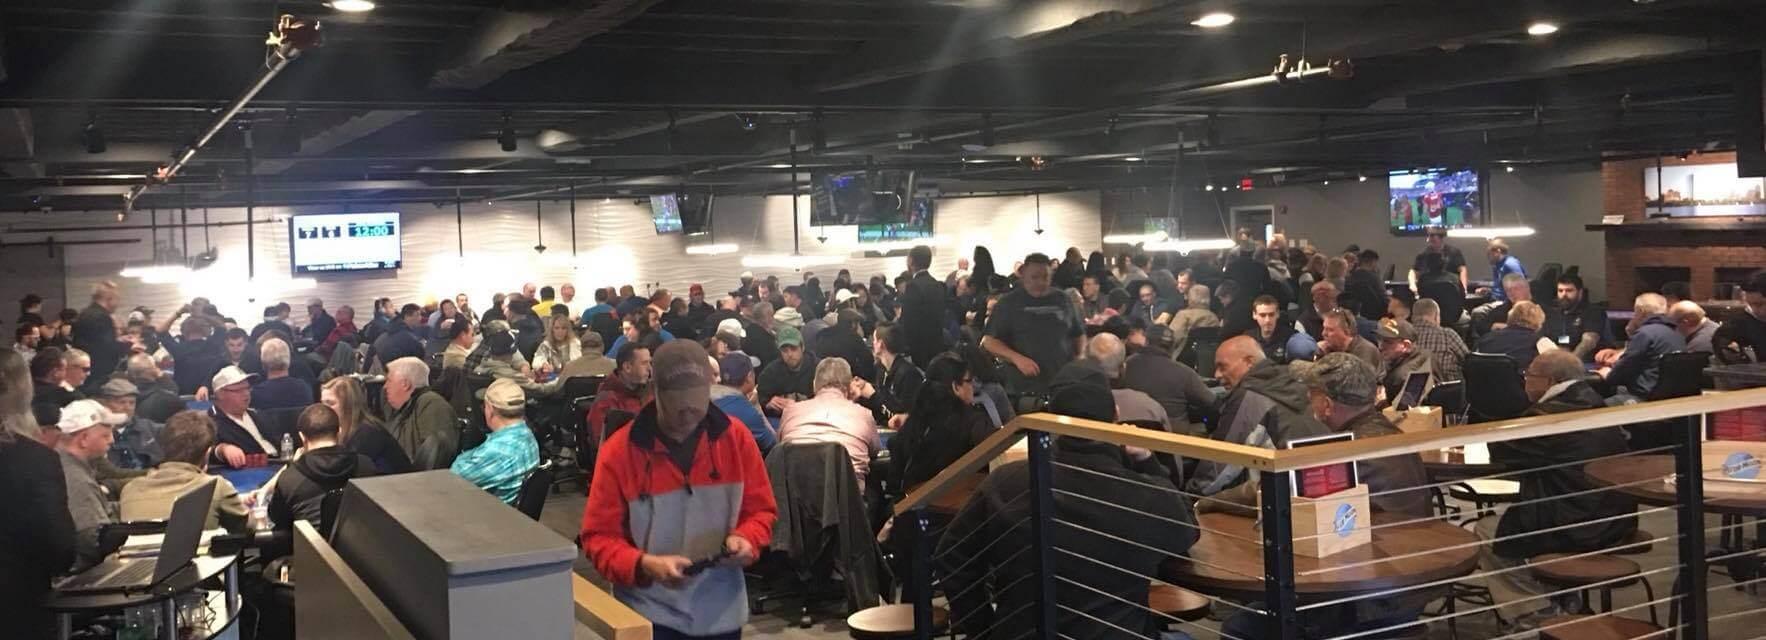 Chase poker room salem nh tabasco slot machine online